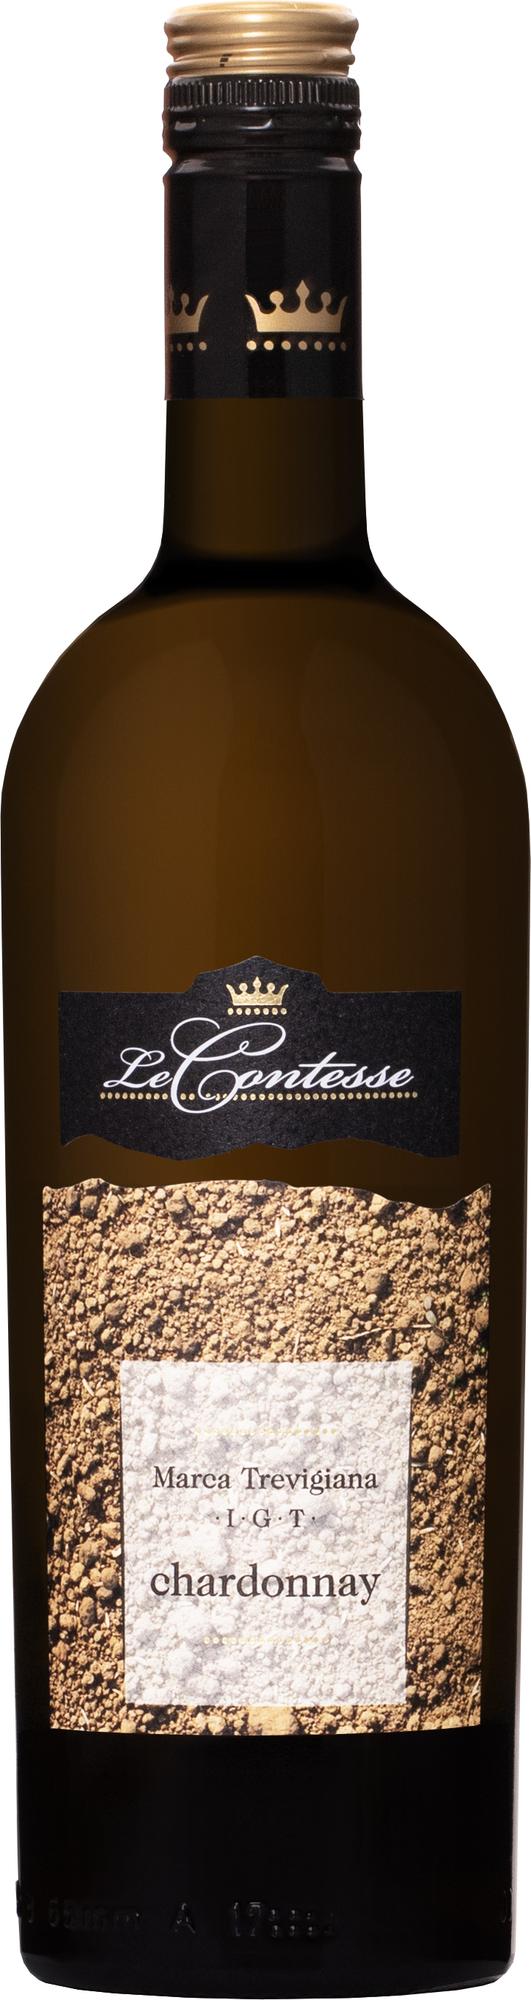 Le Contesse Chardonnay IGT Marca Trevigiana 12% 0,75l